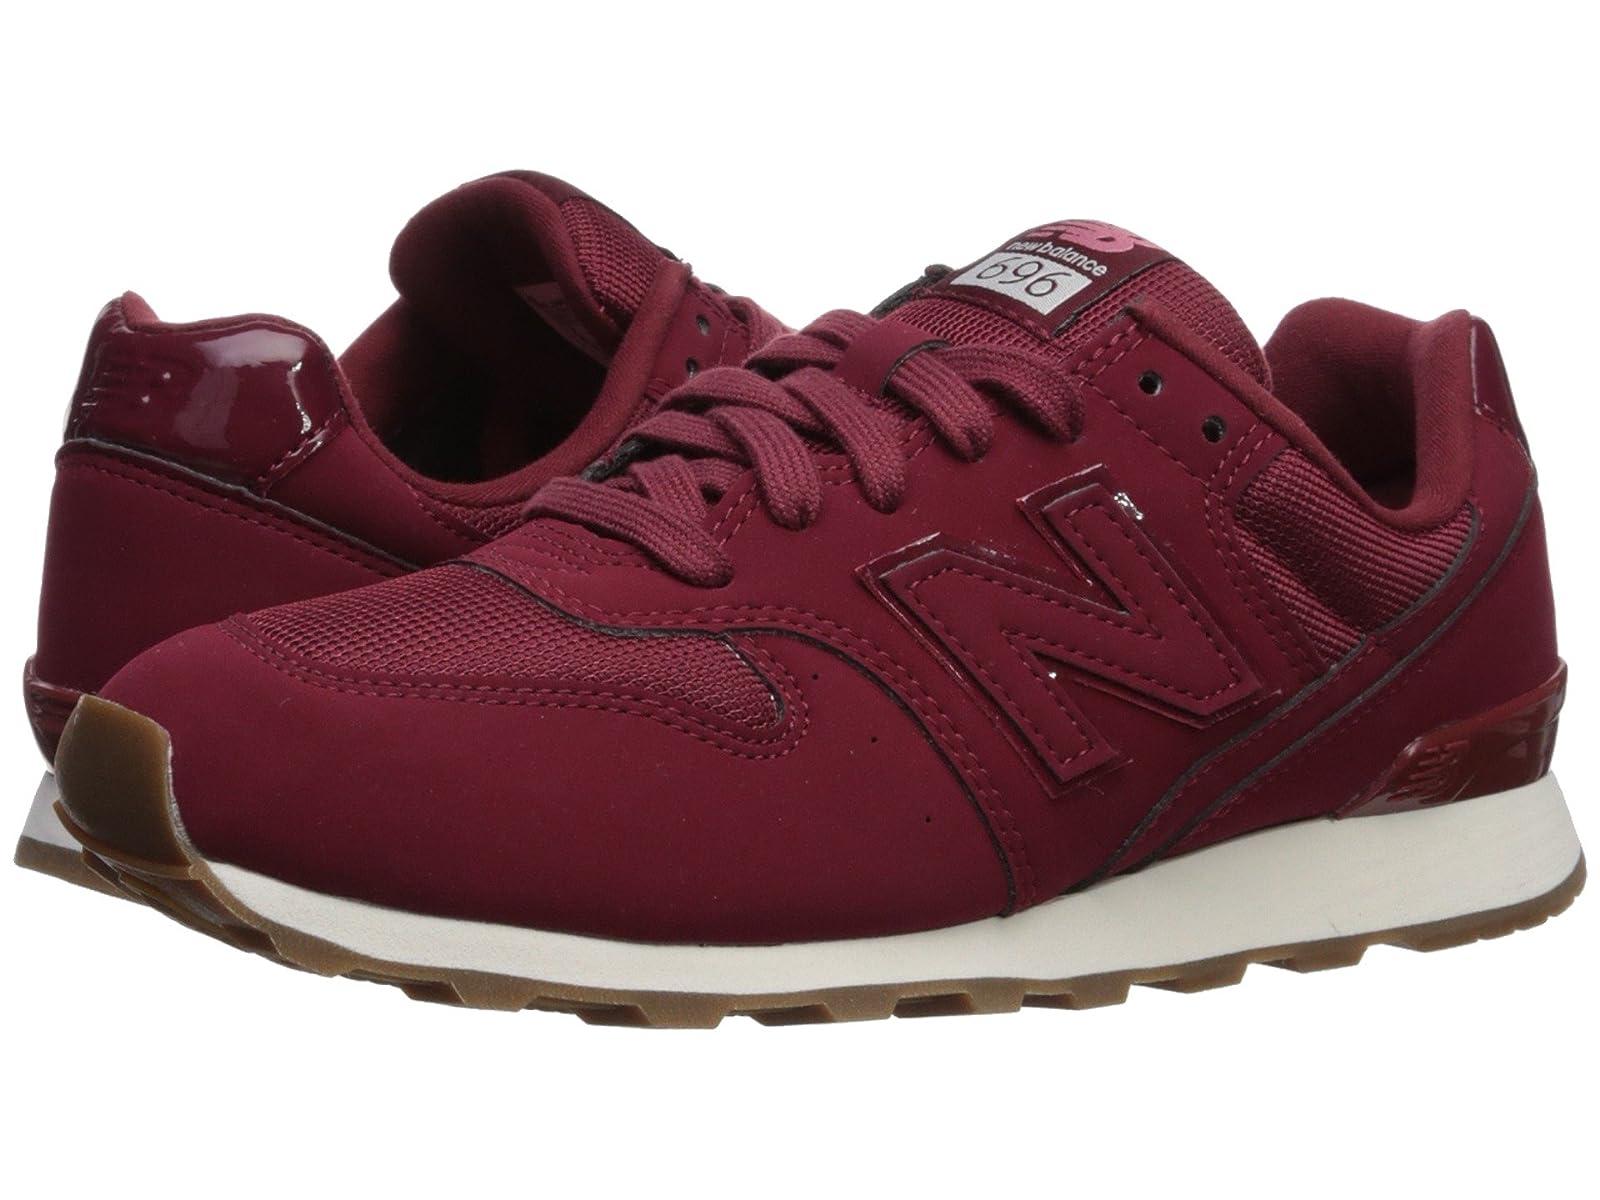 New Balance Classics WL696v1Cheap and distinctive eye-catching shoes